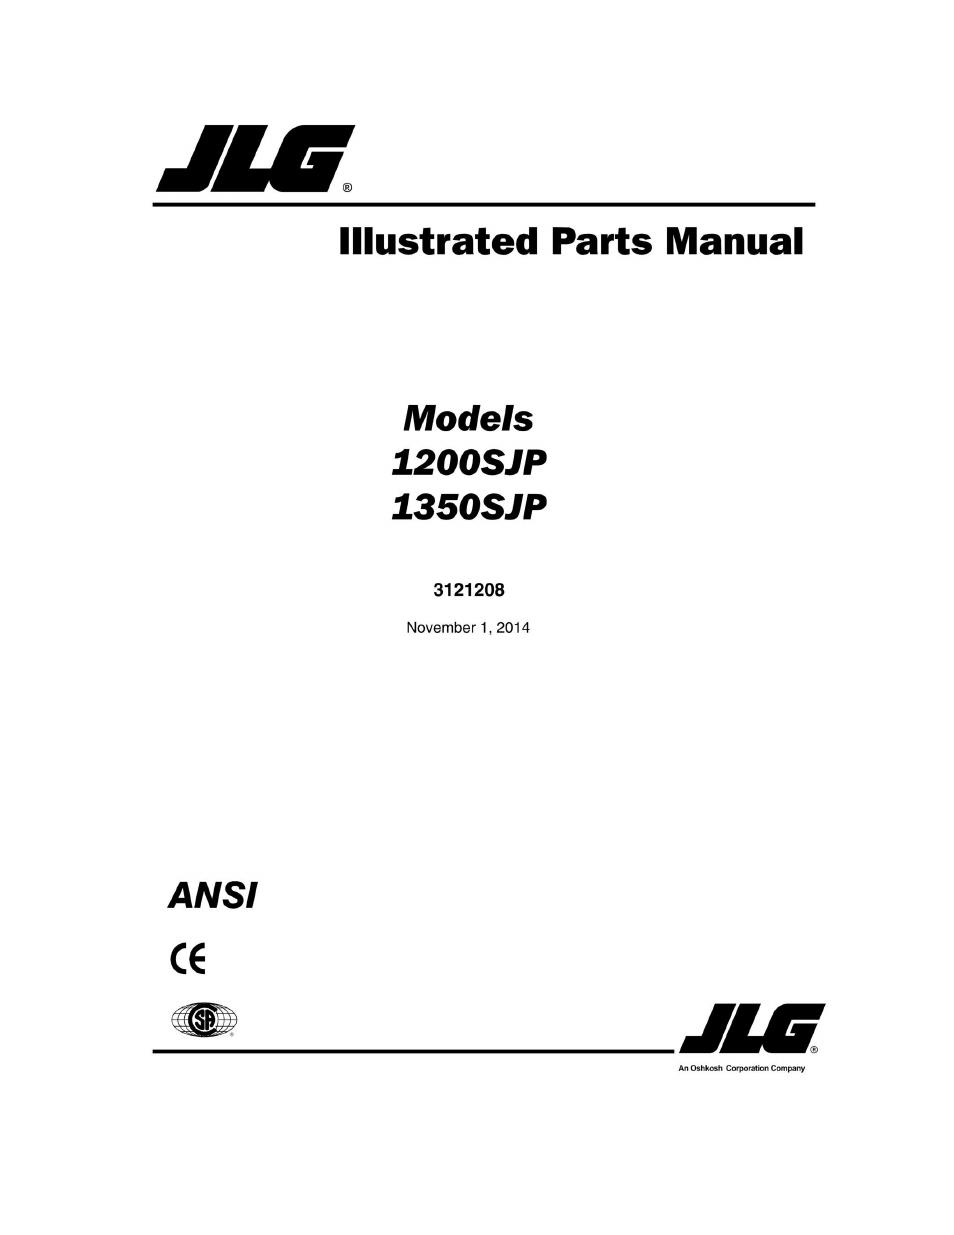 JLG 1350SJP Parts Manual User Manual 454 pages – Jlg Model 42 Wiring Diagram